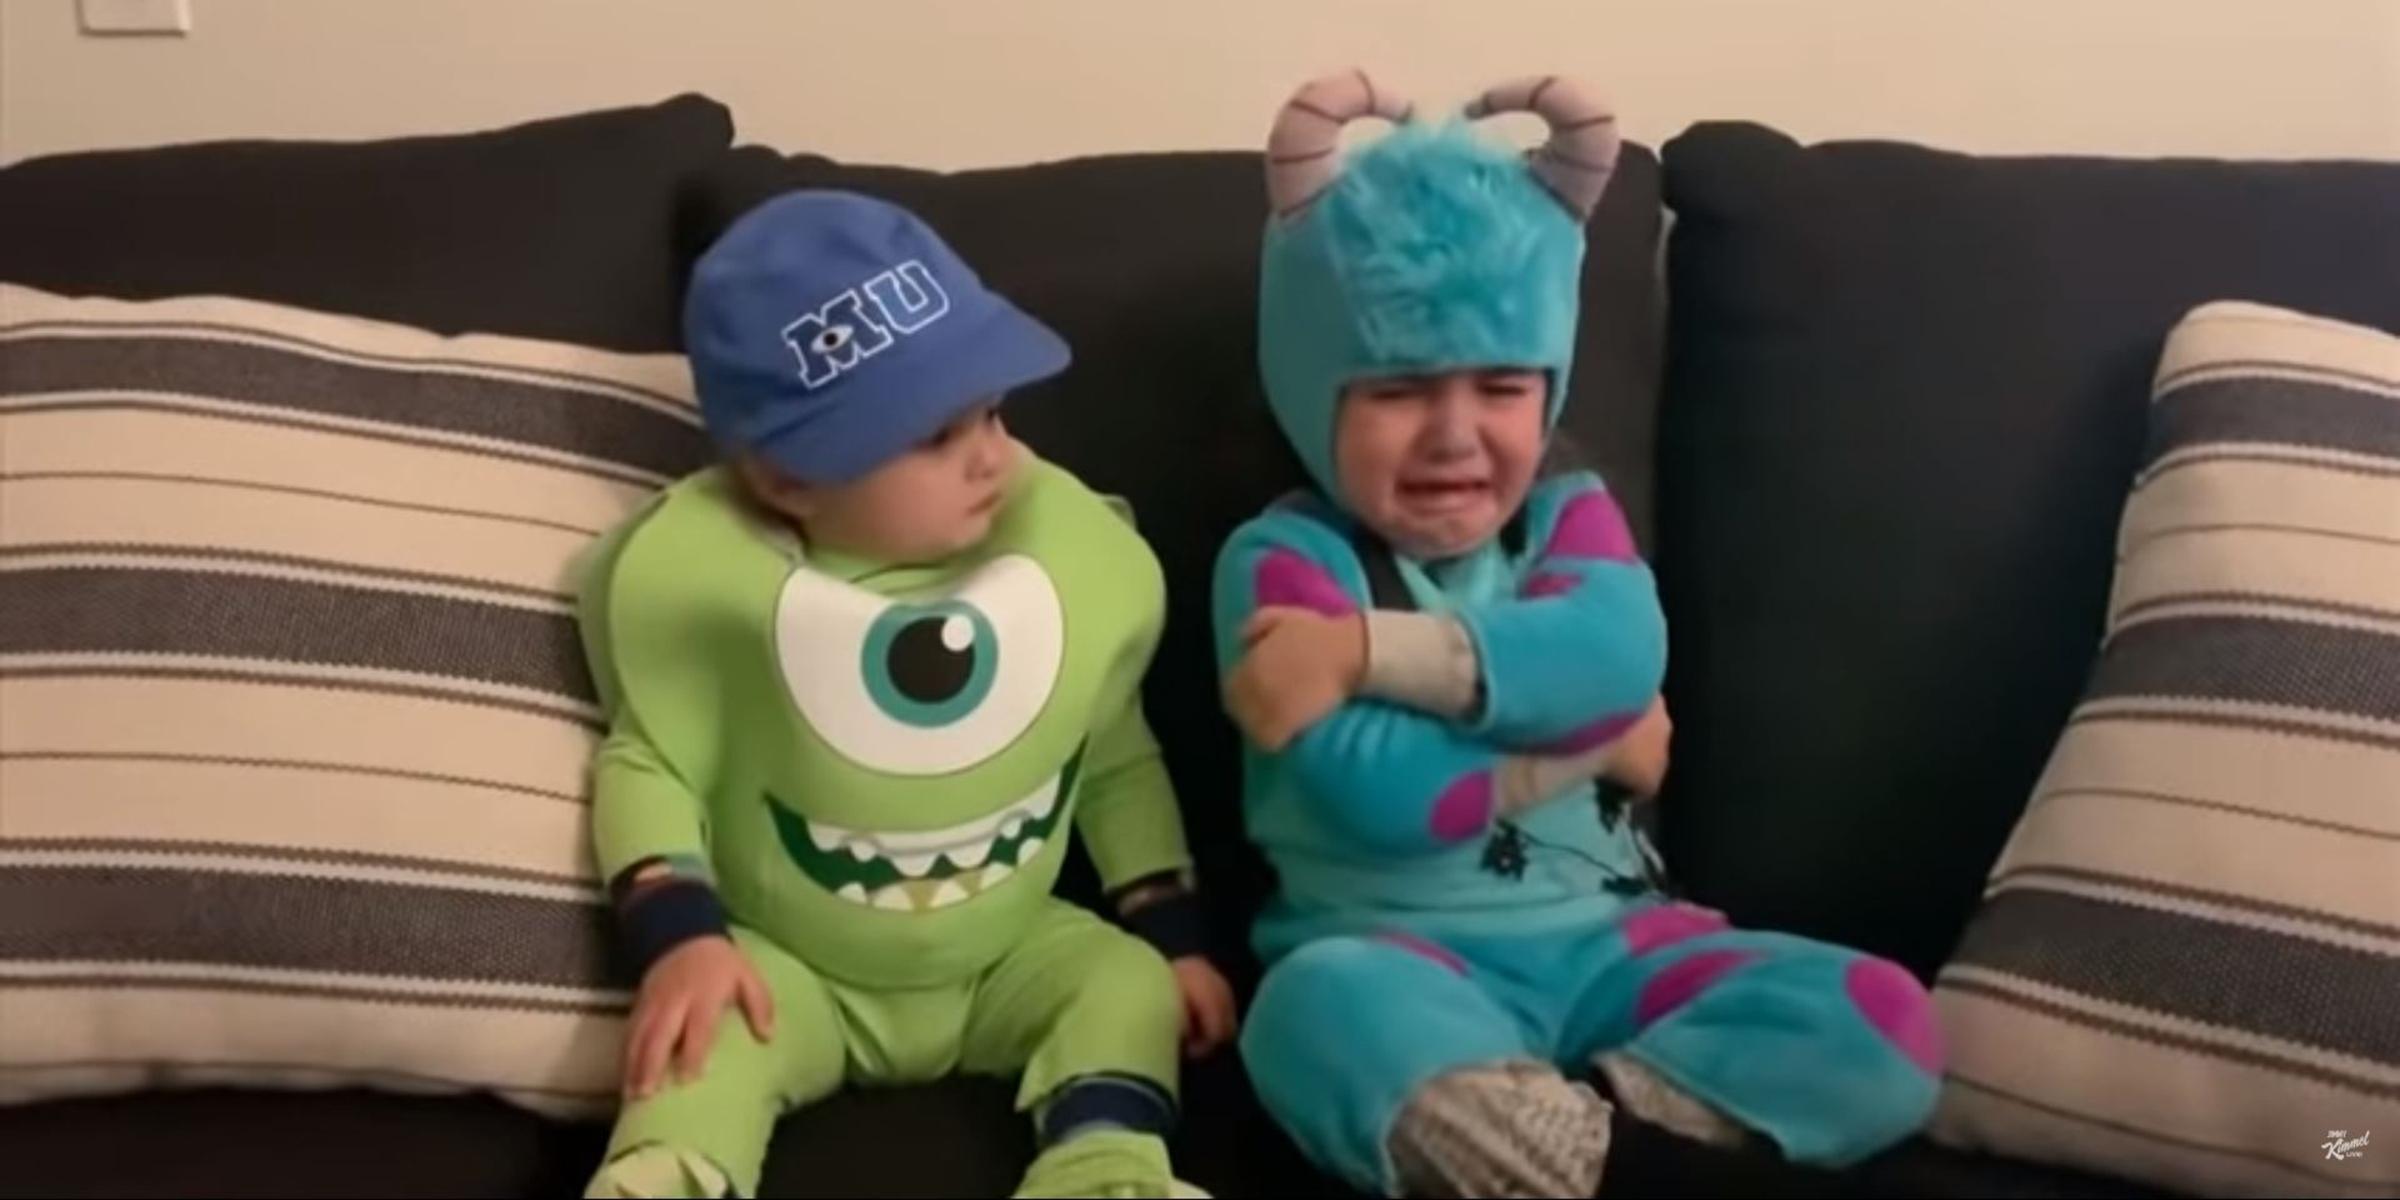 Jimmy Kimmel Halloween Candy Prank 2021.Jimmy Kimmel S Halloween Candy Challenge Has Kids All Fired Up